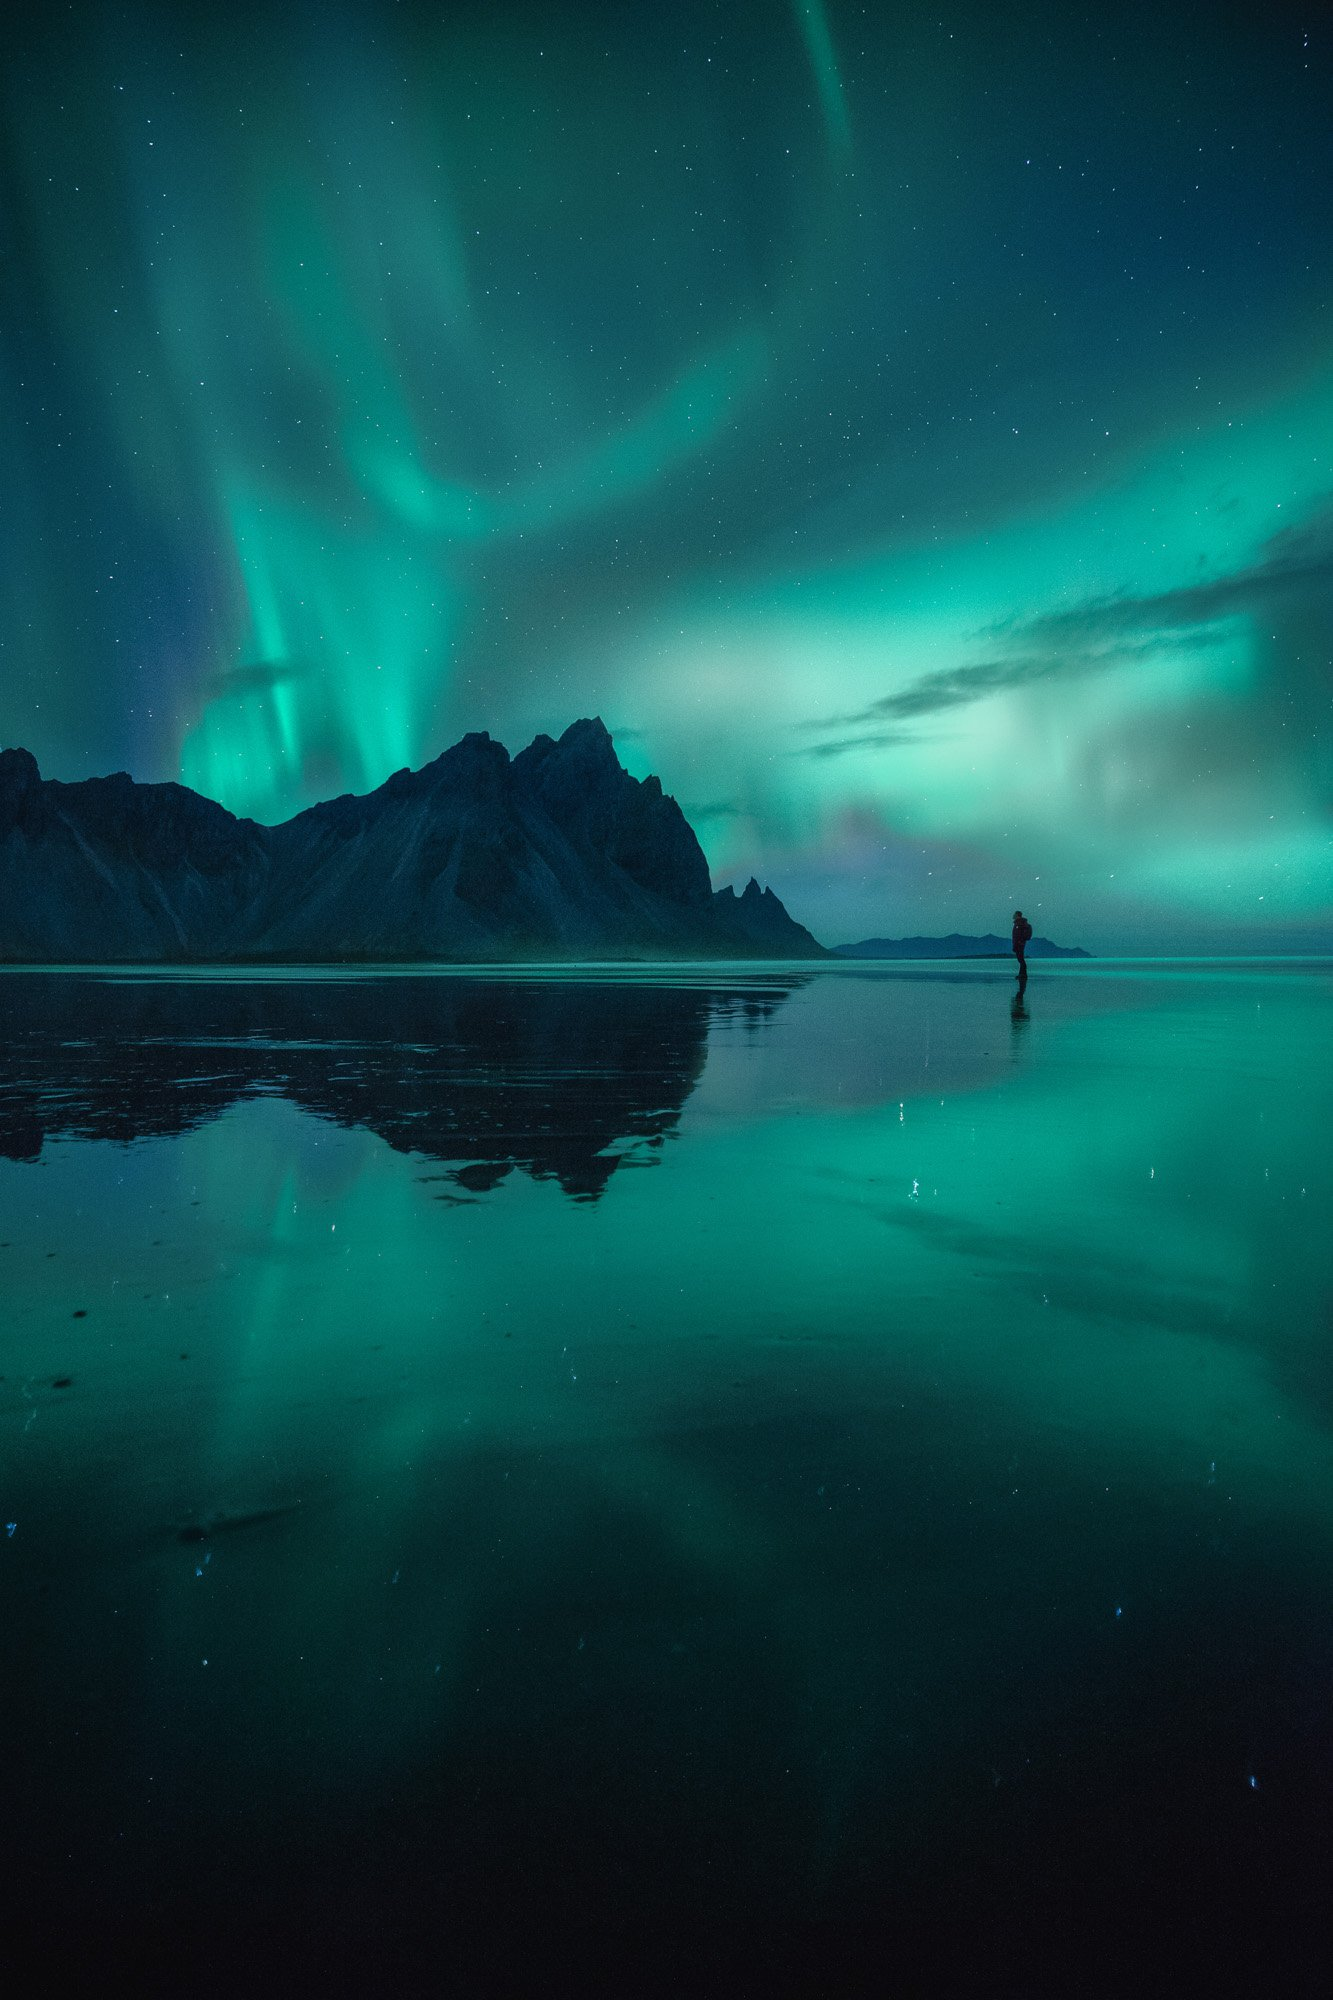 Aurora Boreal en un lago de Islandia - Linzex